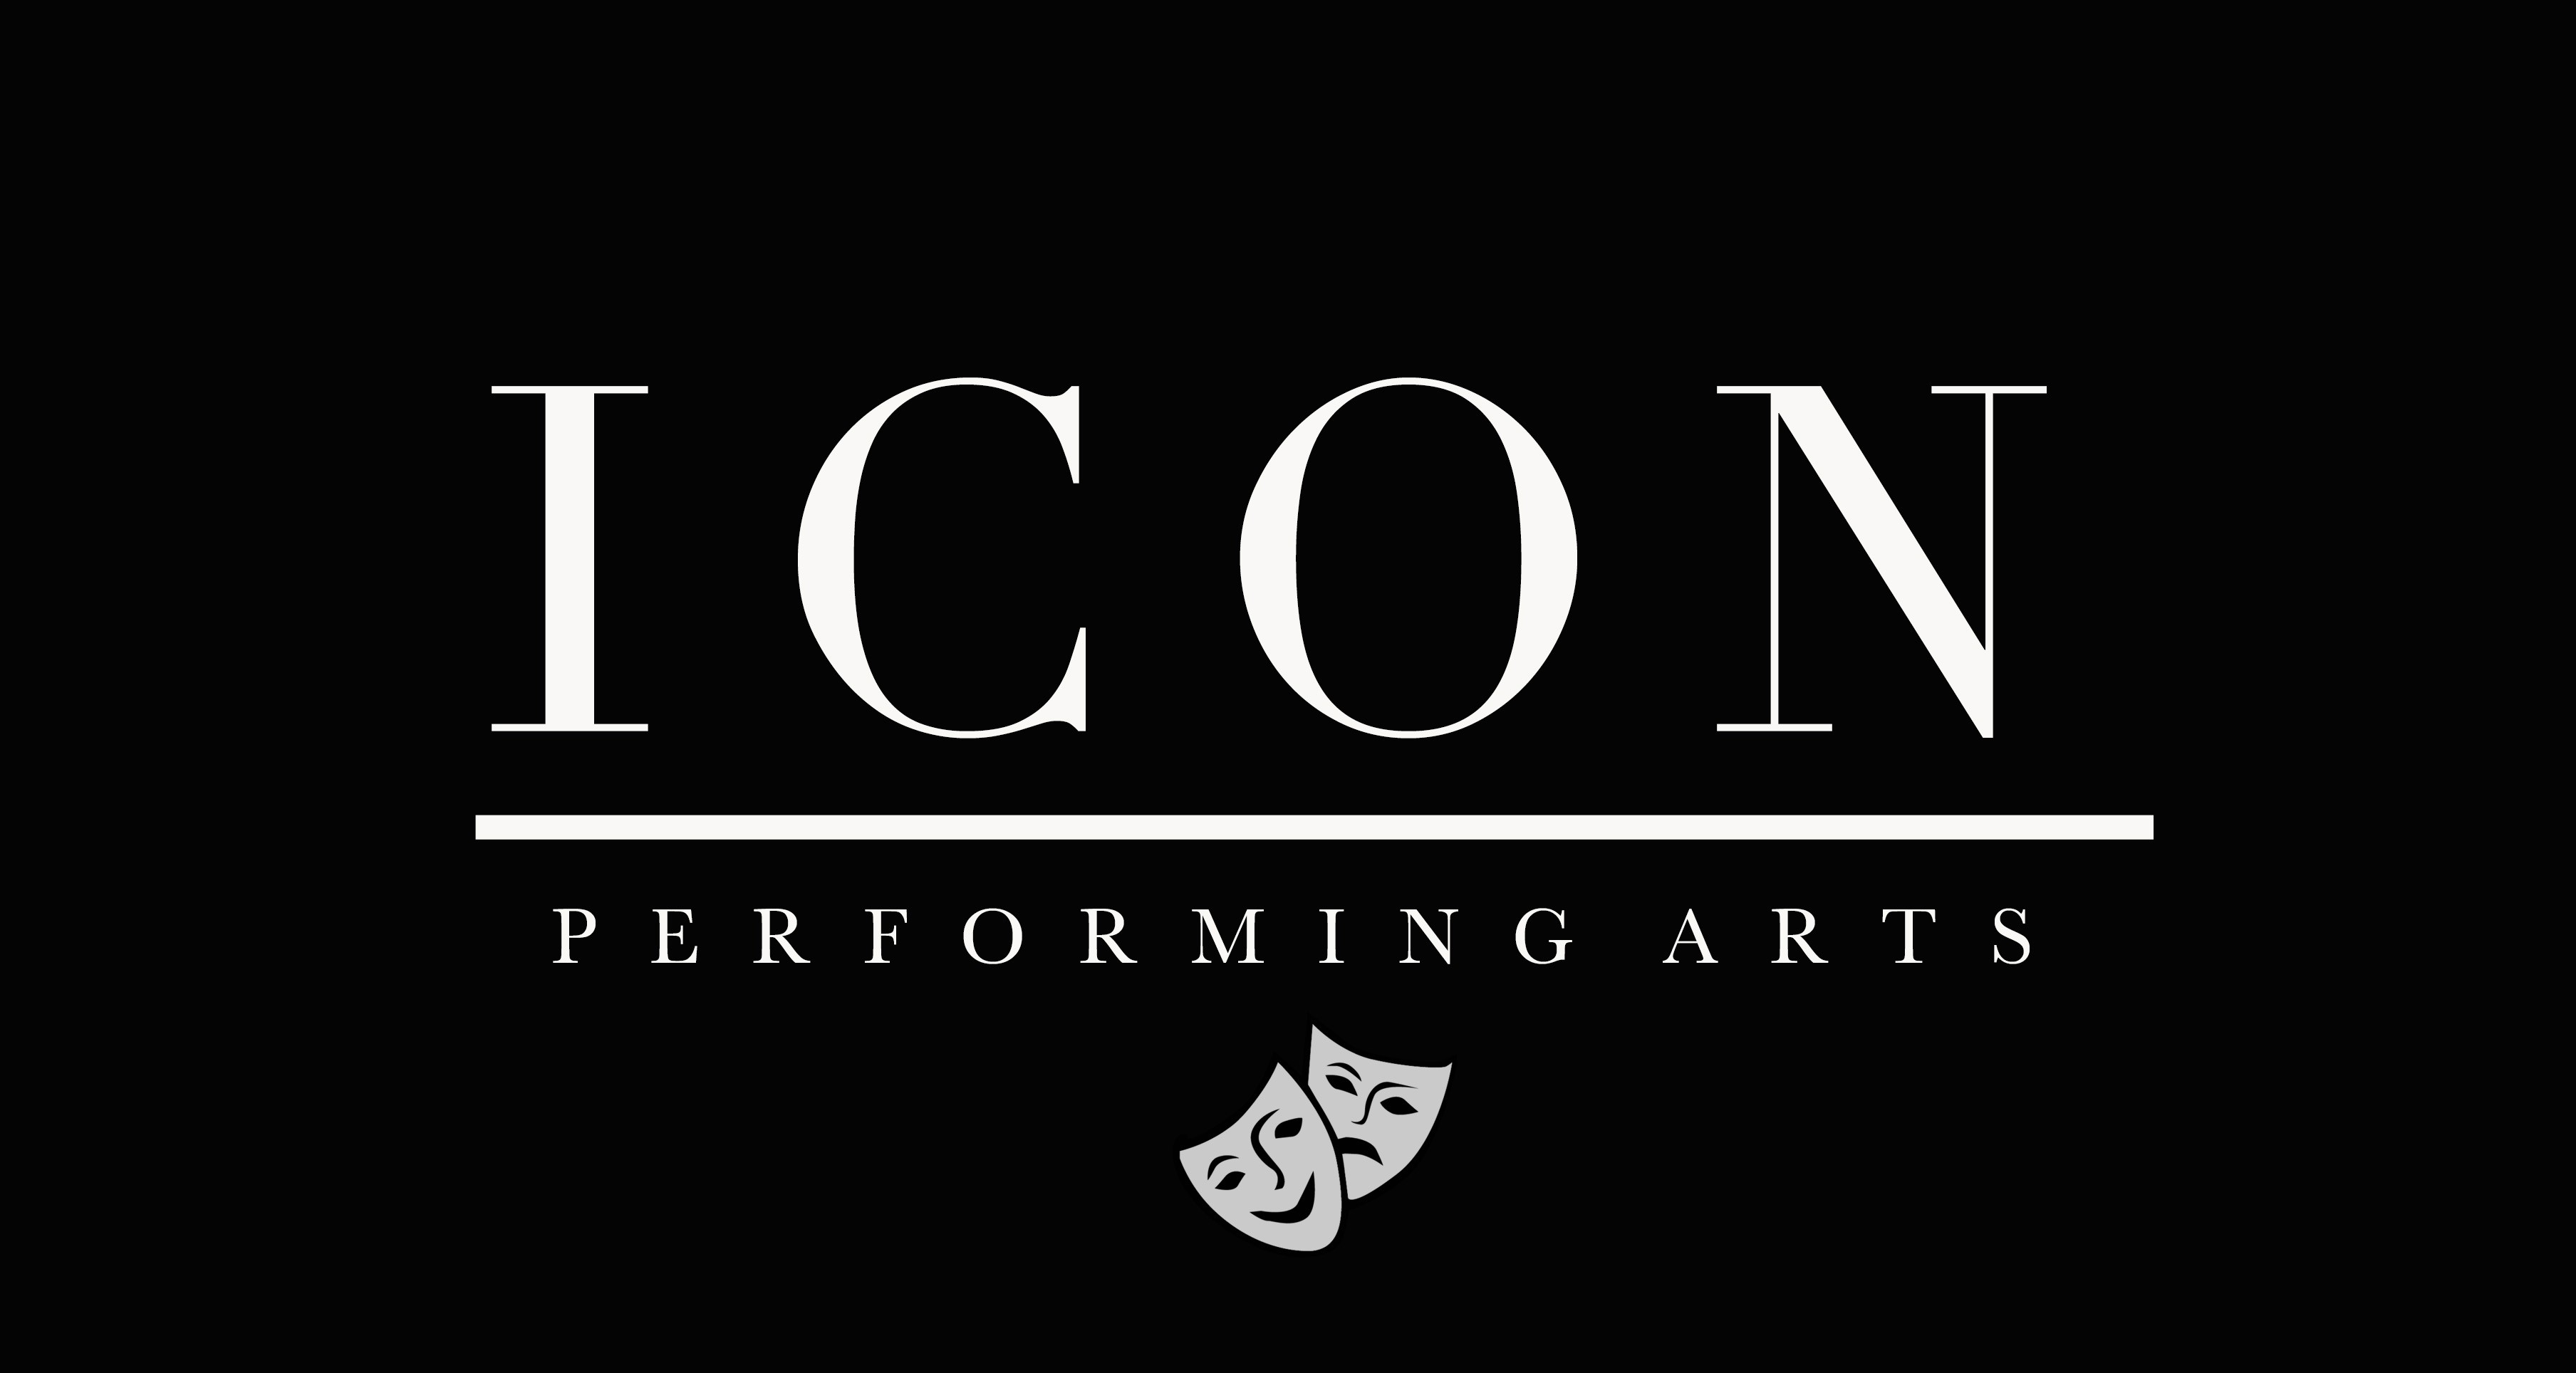 ICON Performing Arts image 1